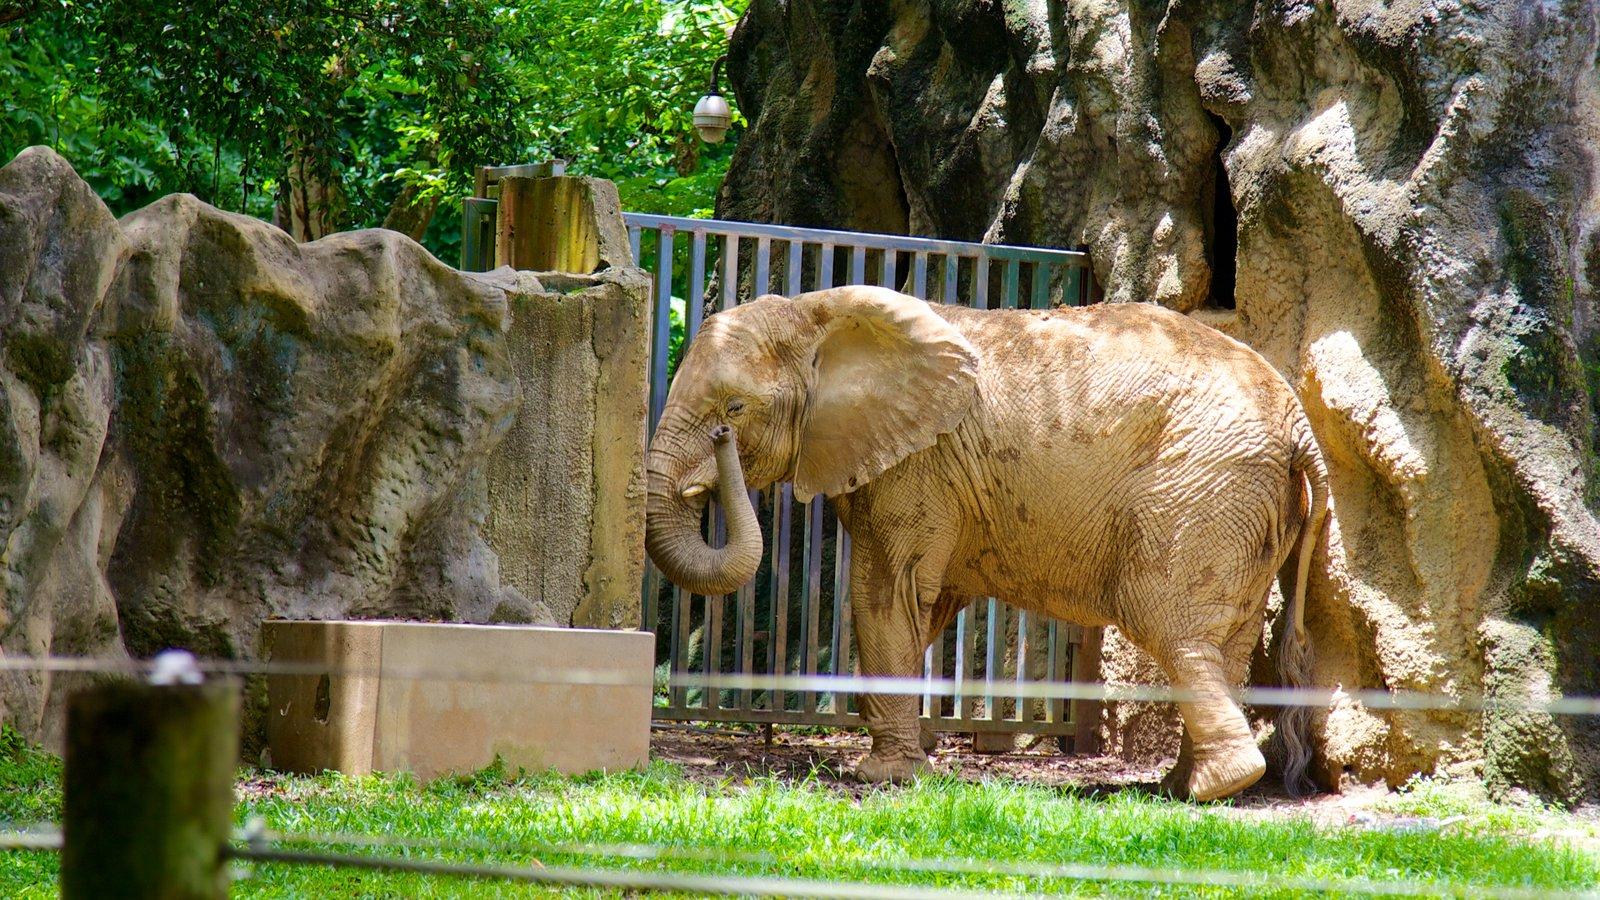 Mayaguez Zoo featuring zoo animals and land animals